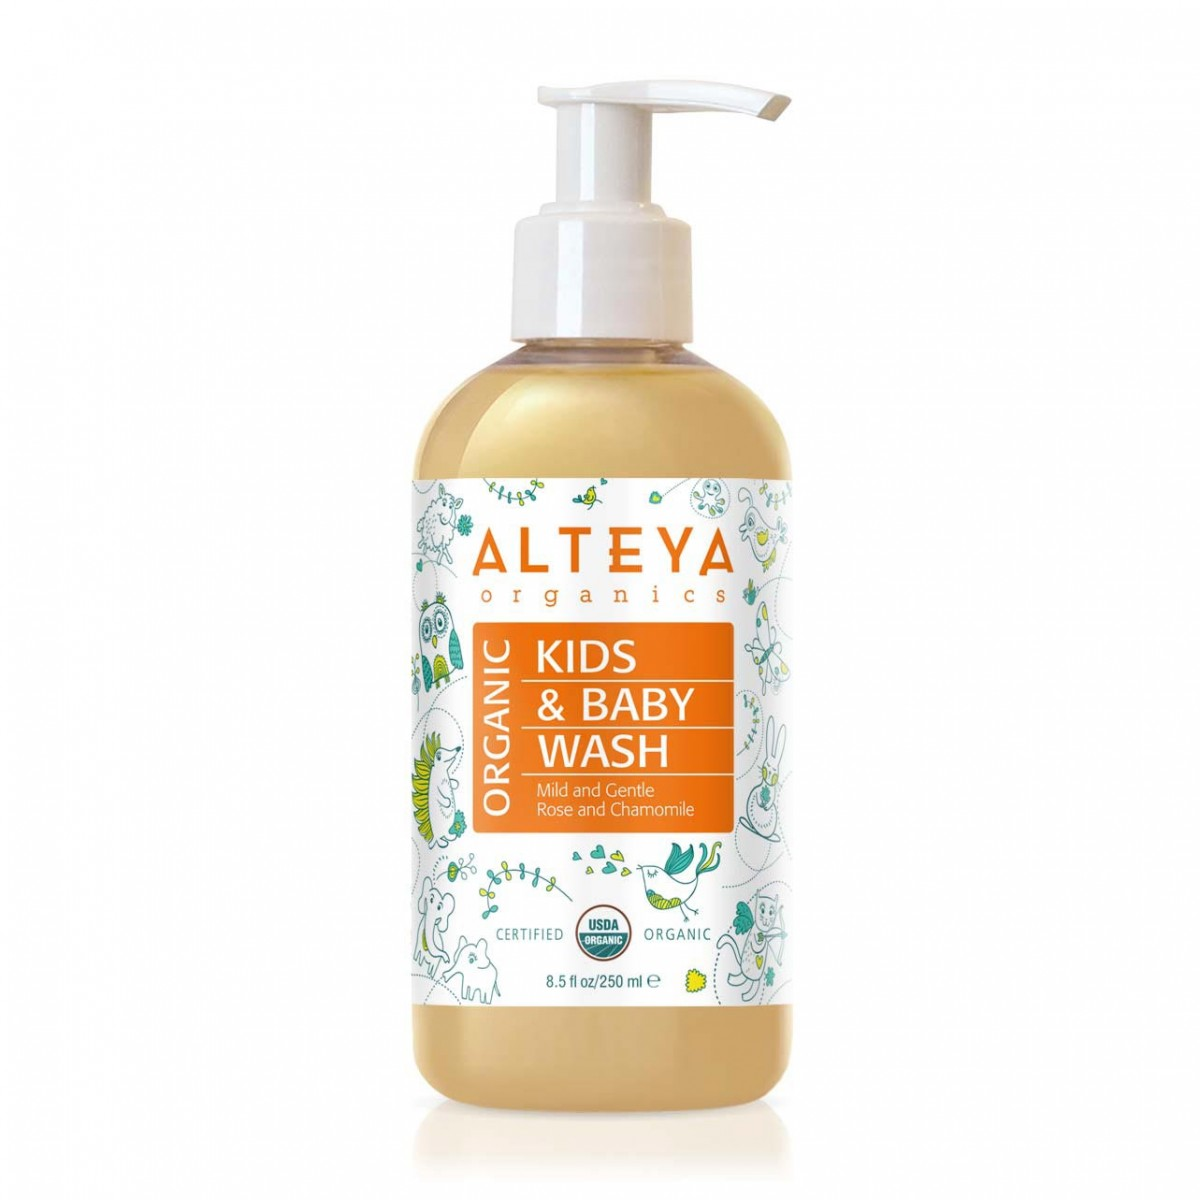 Bio organic baby wash 150 ml. Alteya Organics